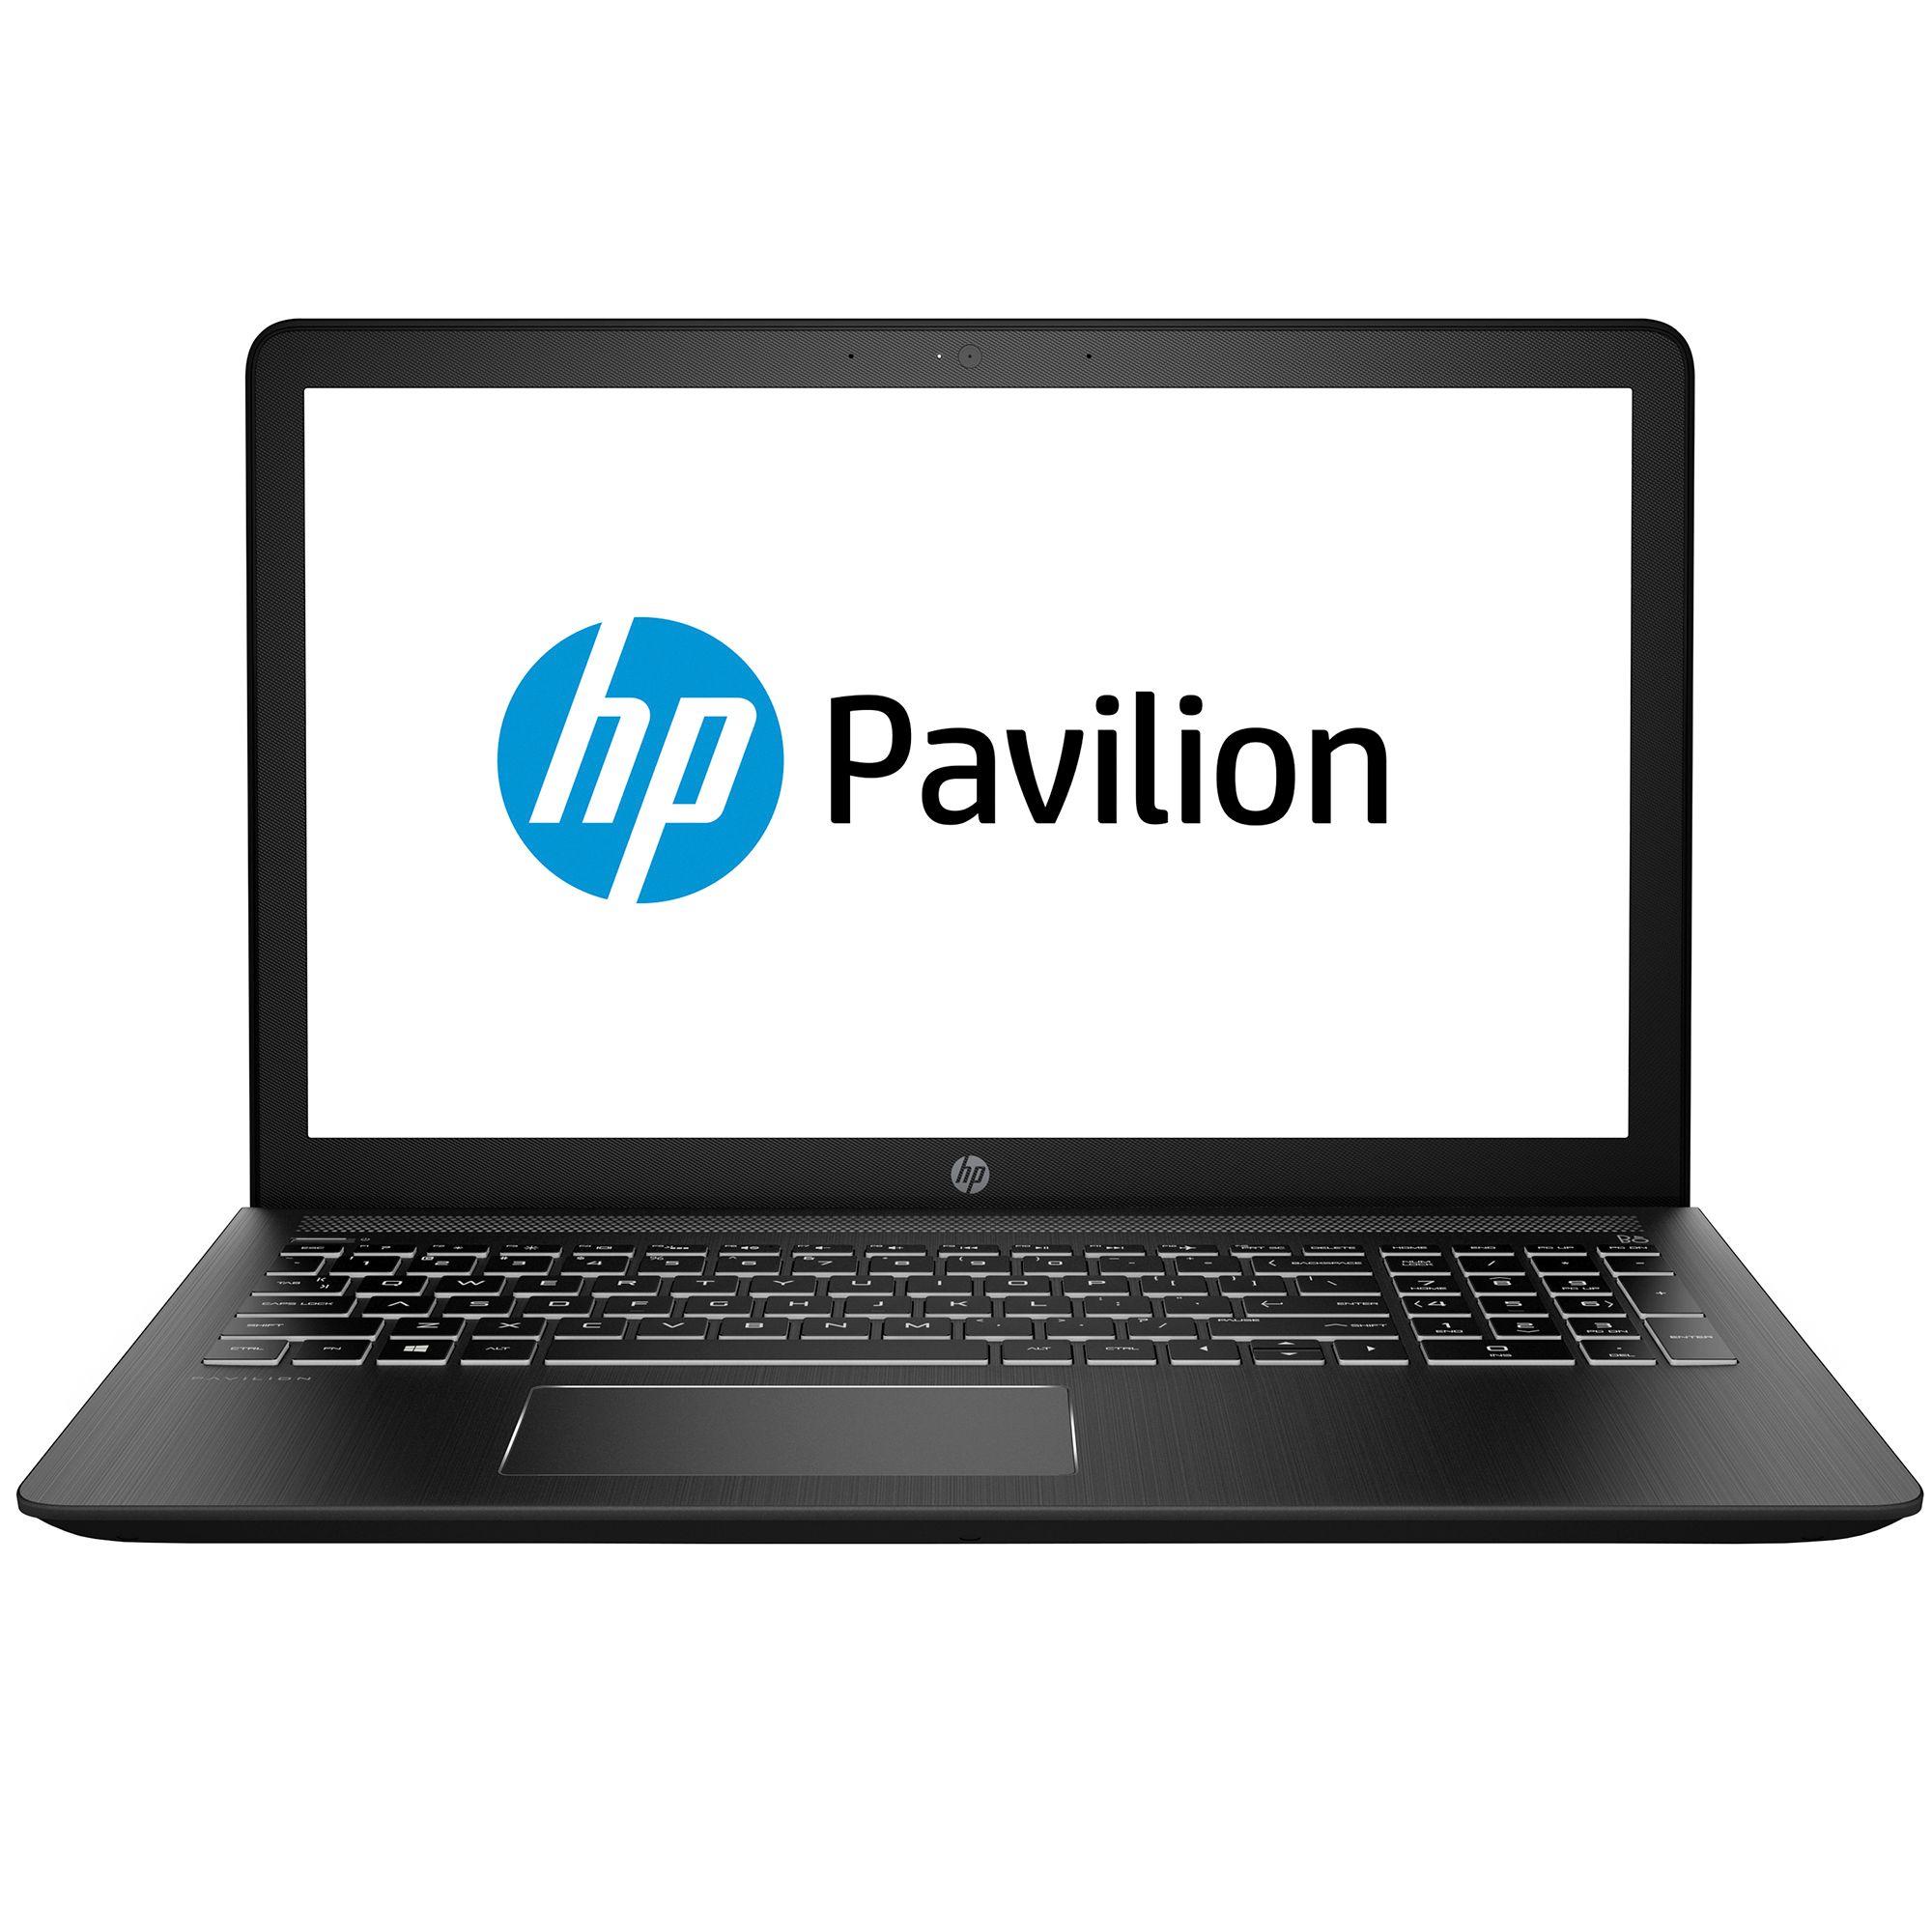 Notebook HP Pavilion Power 15.6 Full HD Intel Core i7-7700HQ GTX 1050-4GB RAM 8GB SSD 256GB FreeDOS